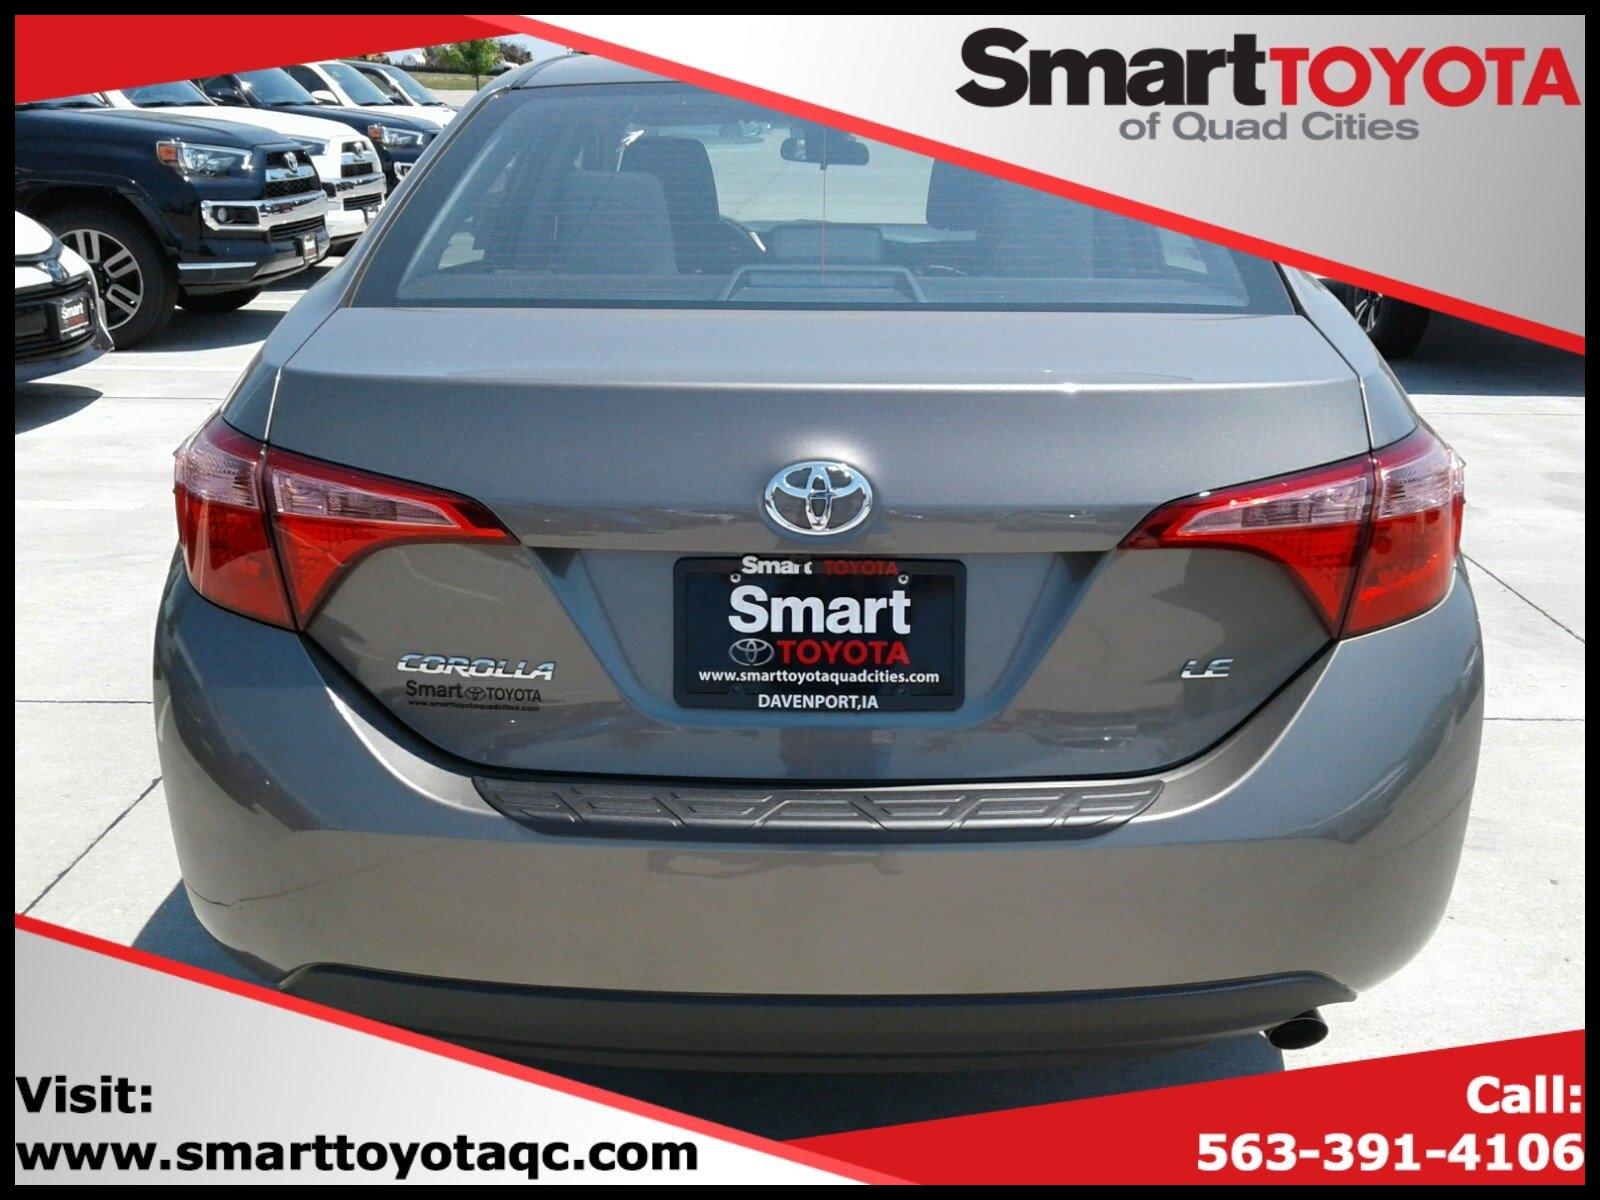 Smart Toyota Quad Cities Davenport IA Car Dealership and Auto Financing Autotrader